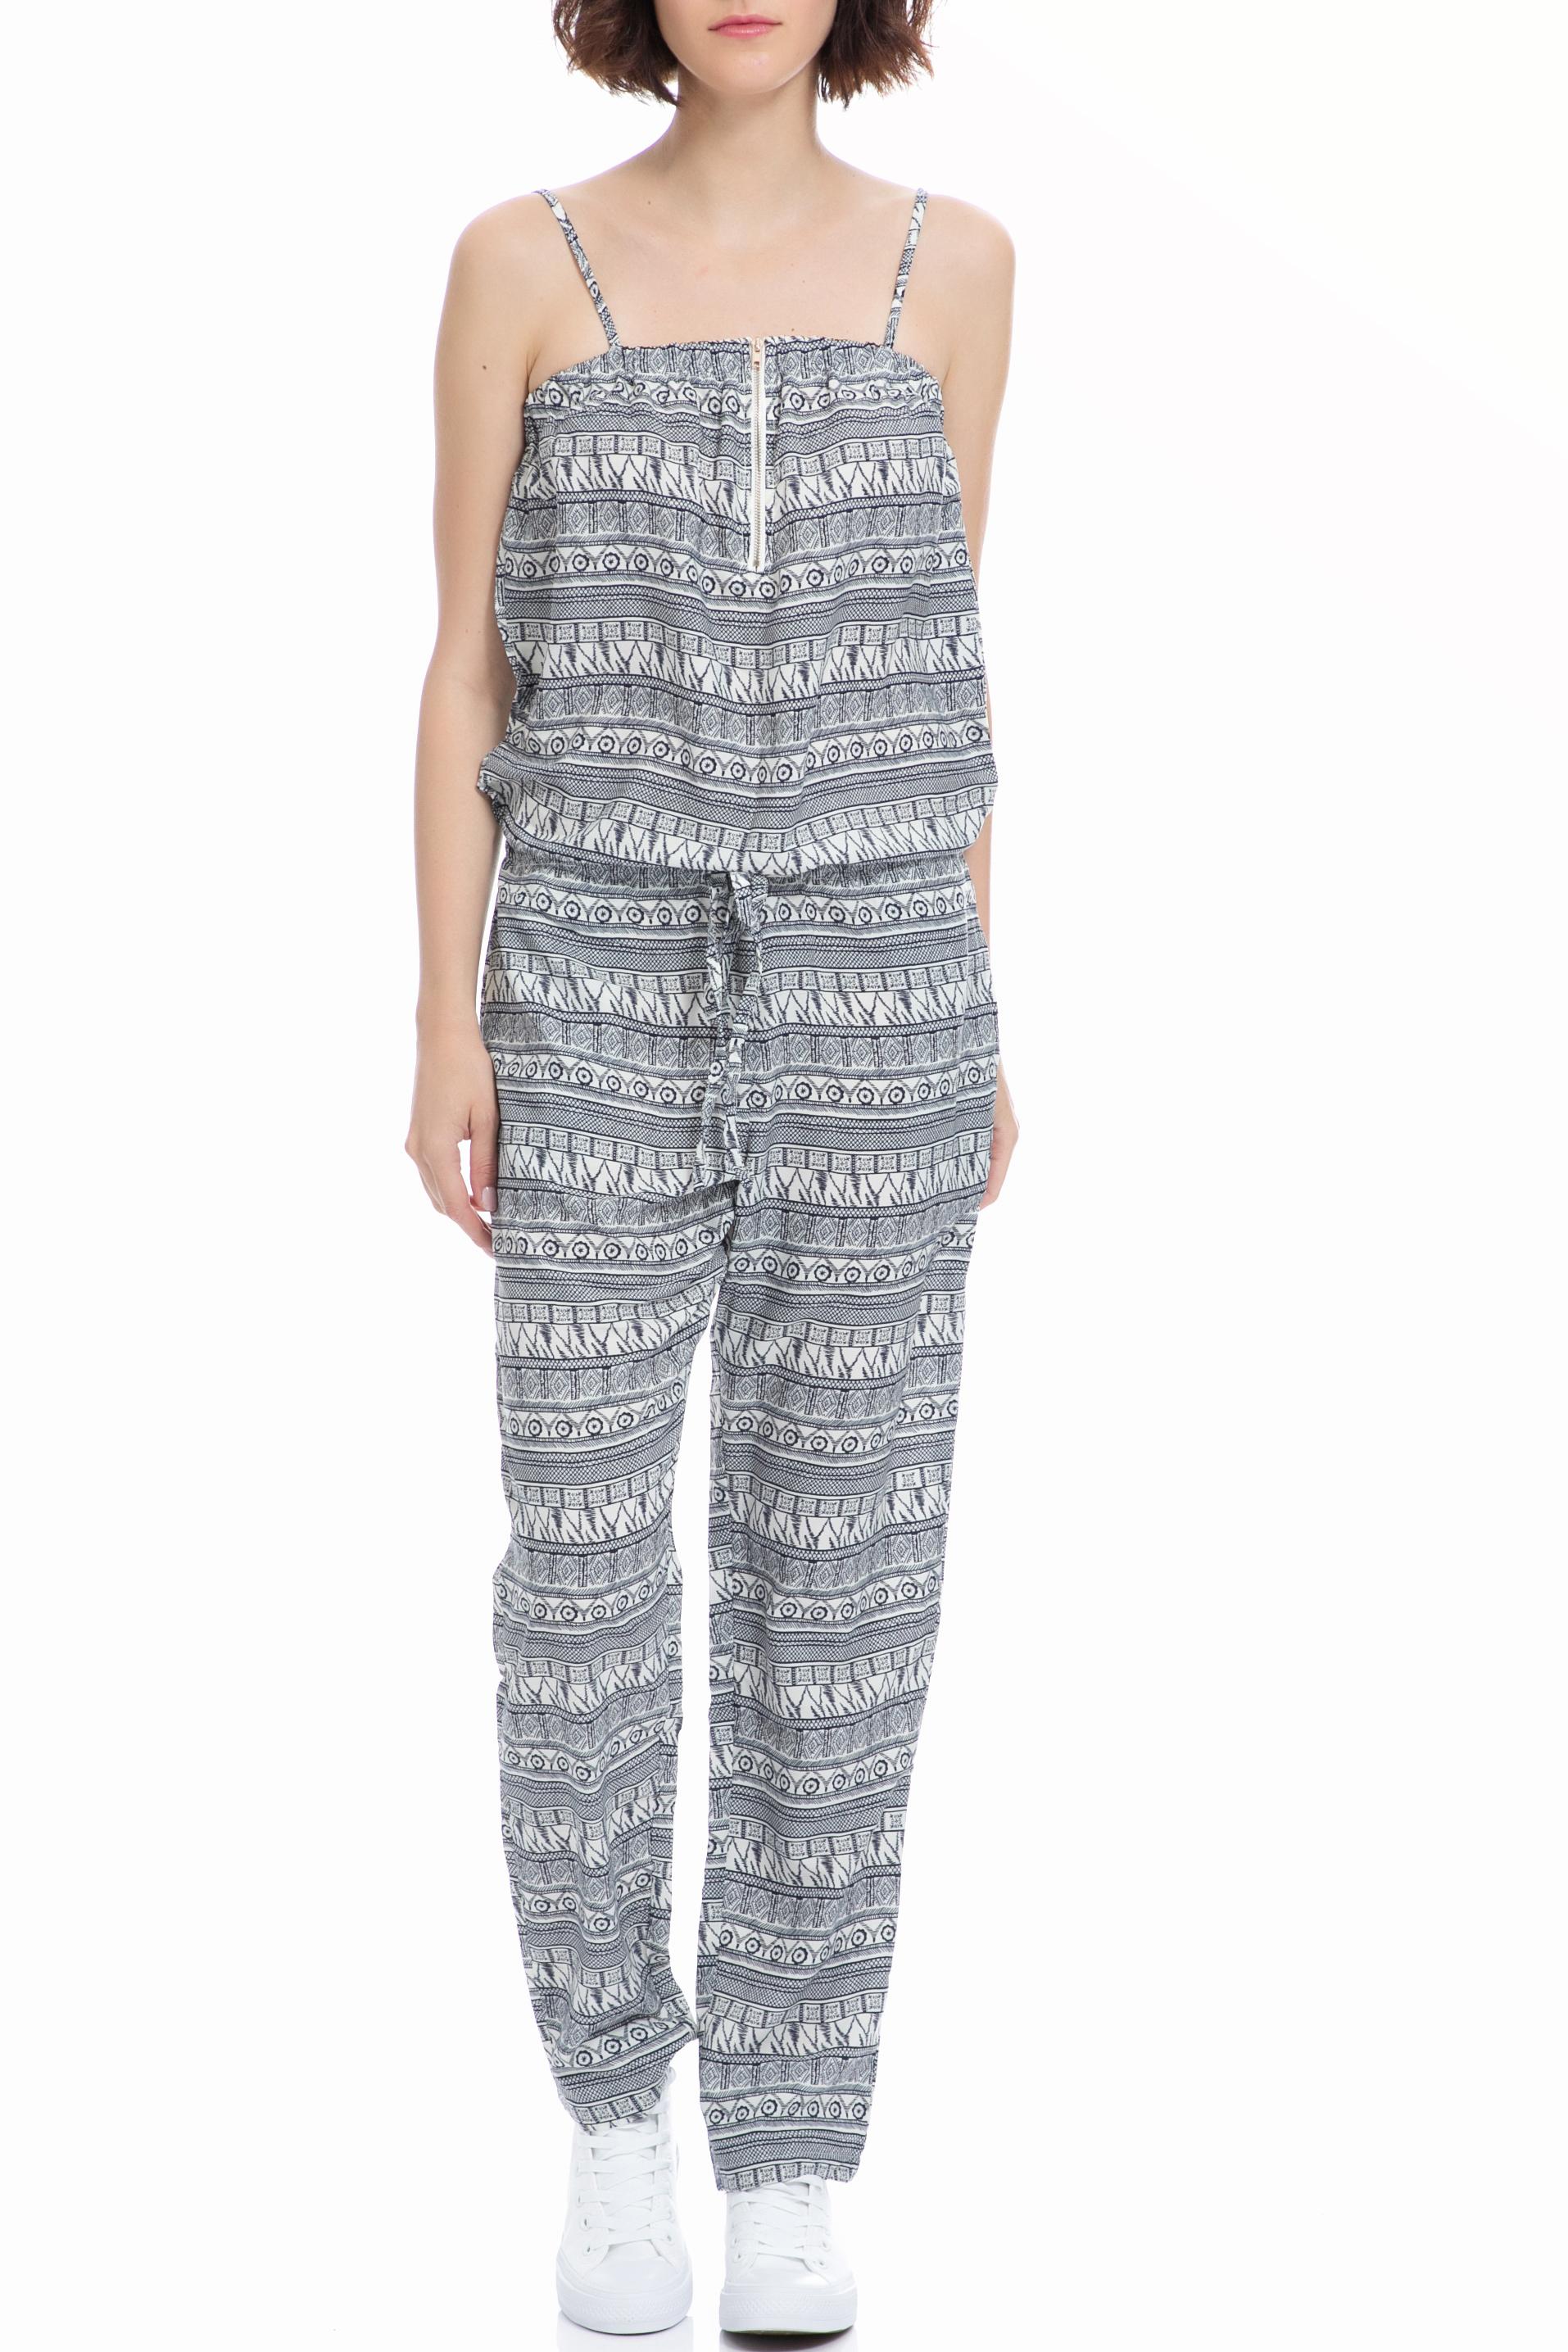 MOLLY BRACKEN - Ολόσωμη φόρμα MOLLY BRACKEN λευκή-μαύρη γυναικεία ρούχα ολόσωμες φόρμες